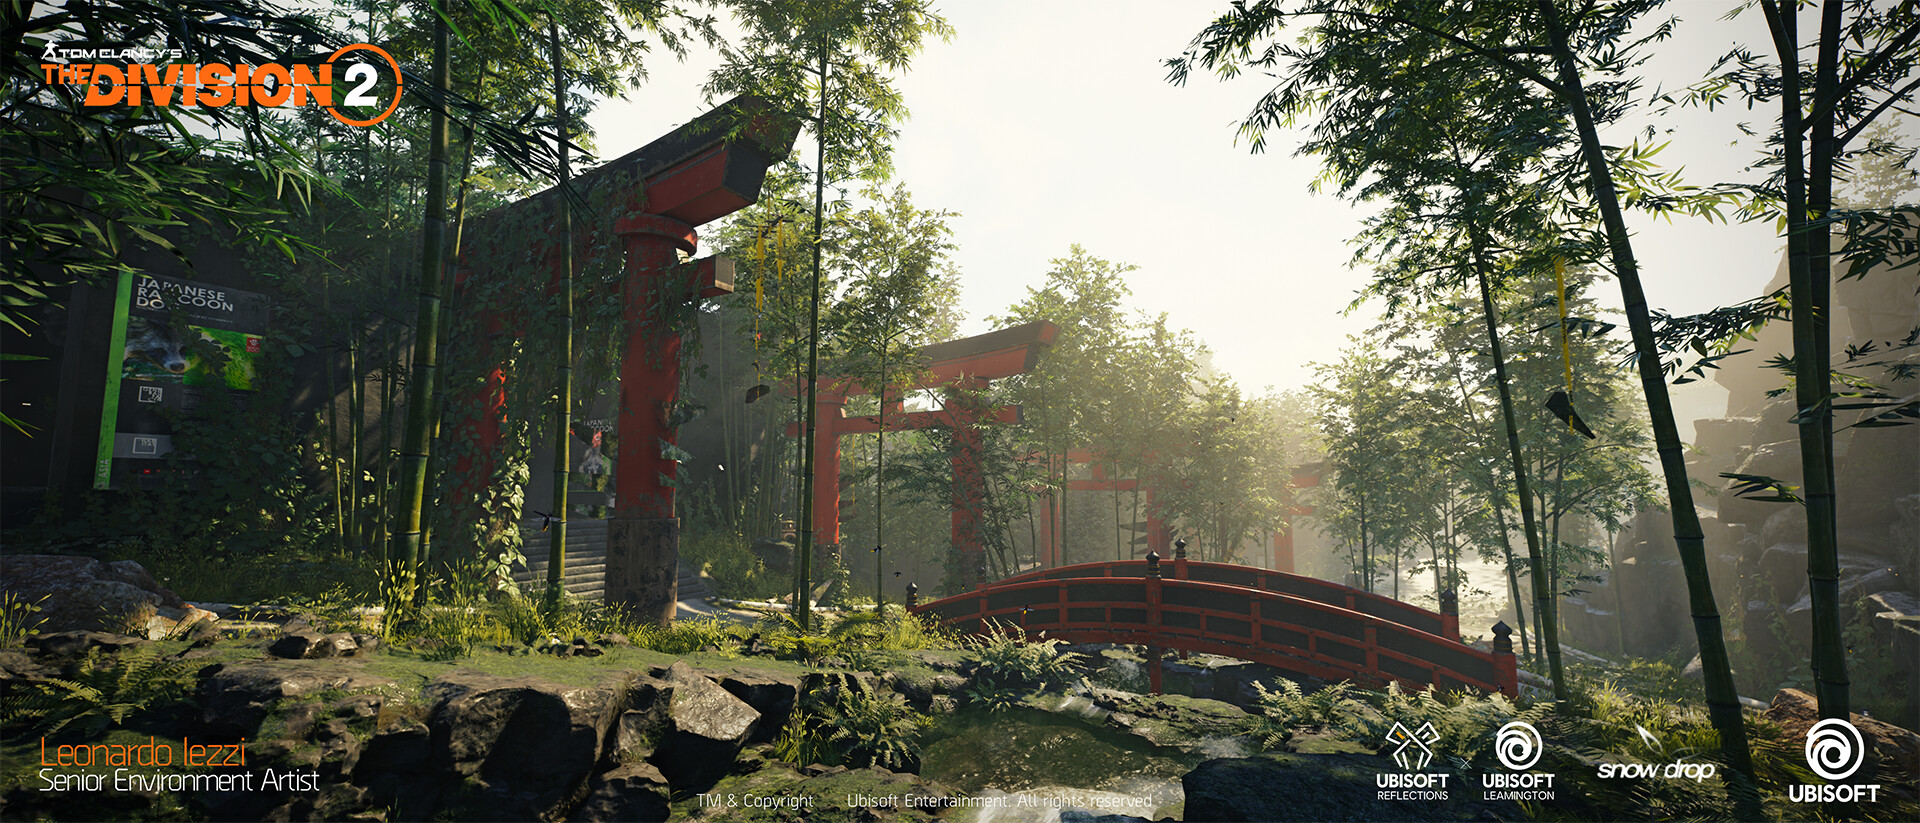 Leonardo iezzi leonardo iezzi the division 2 zoo environment art 03 japan 018 wide